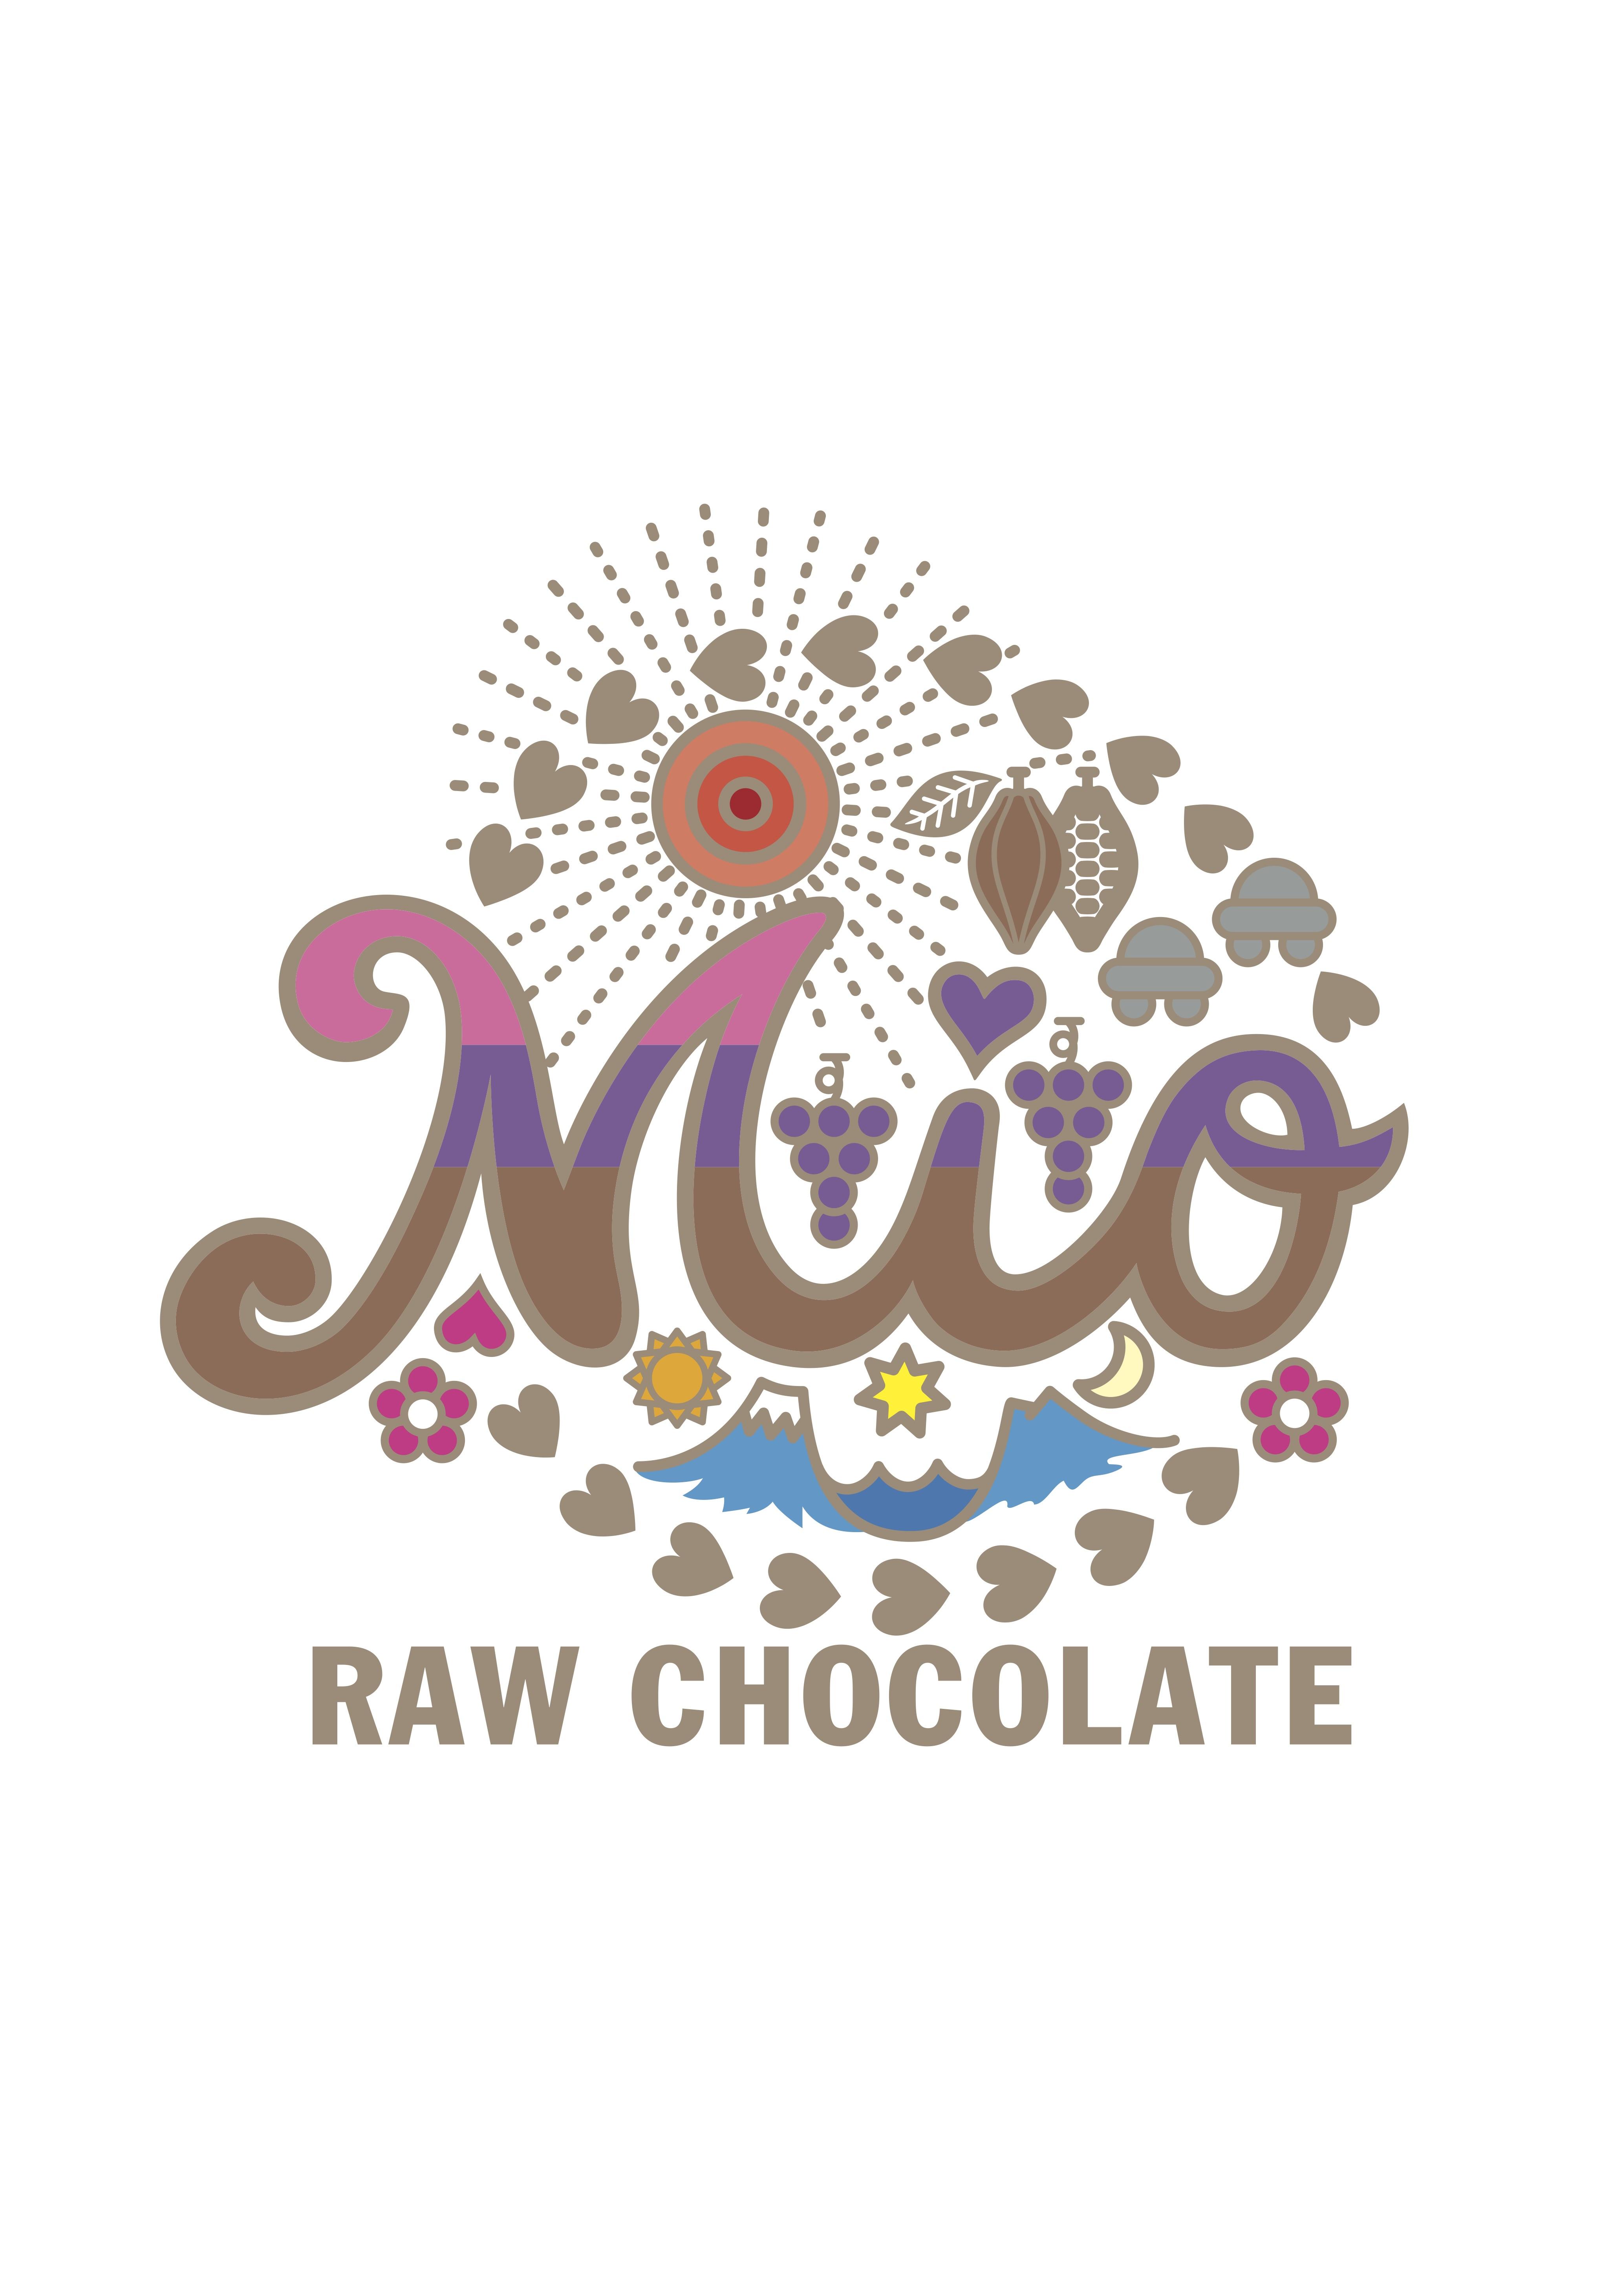 rawchocola_logo.jpg